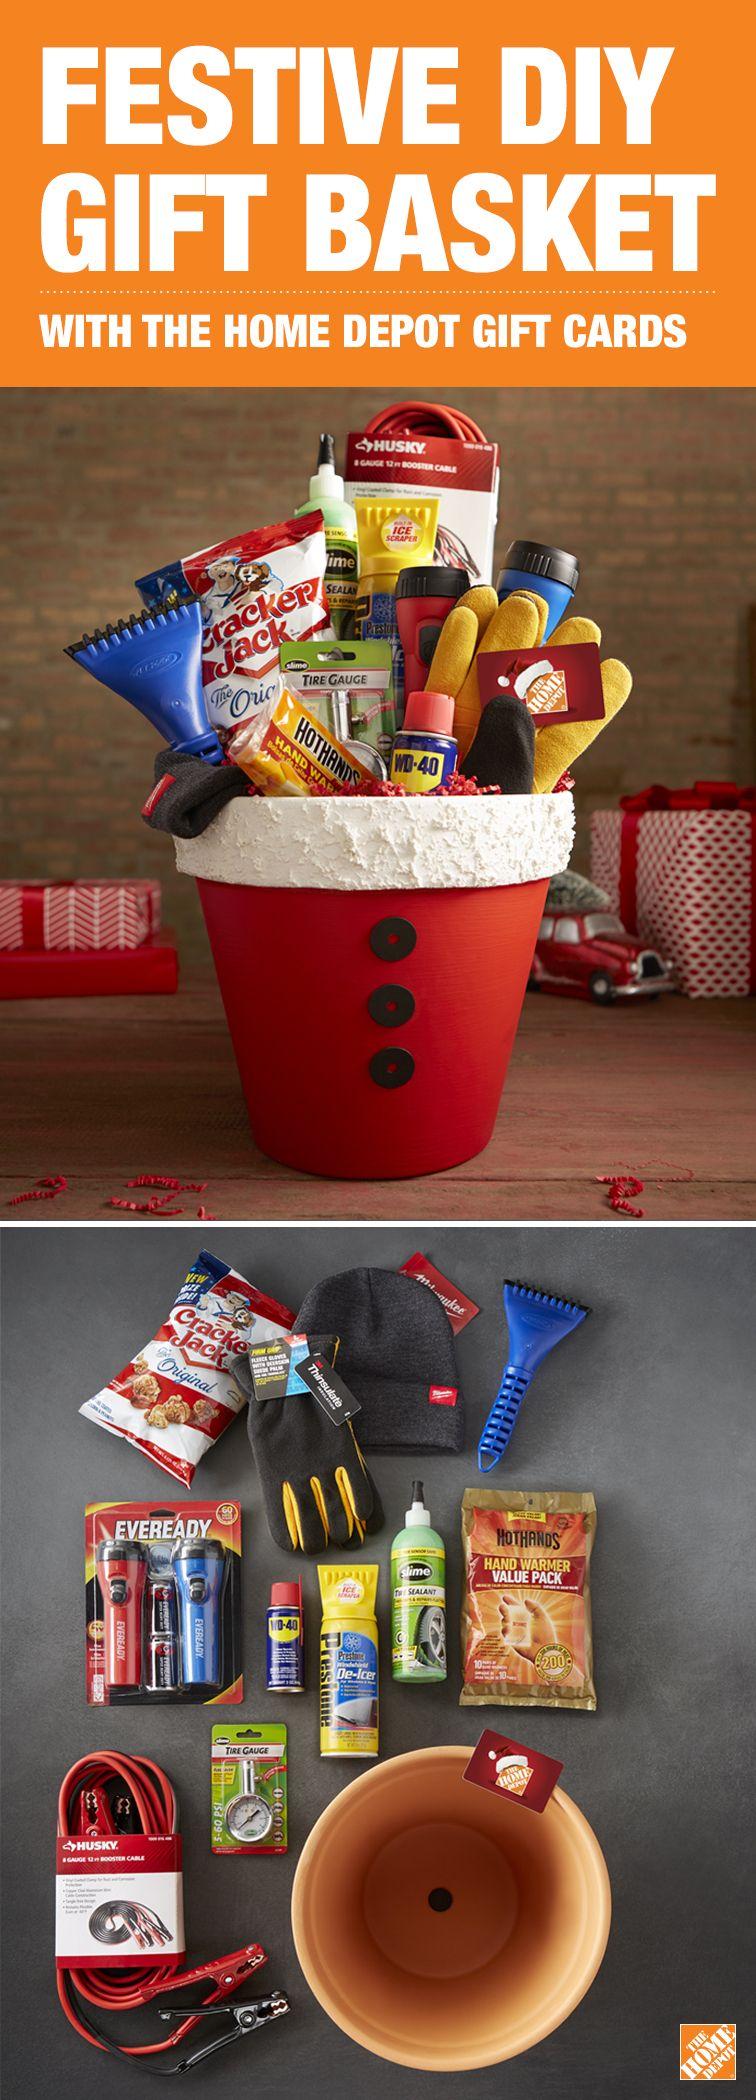 The Home Depot gift card in Santa's Winter Survival Kit